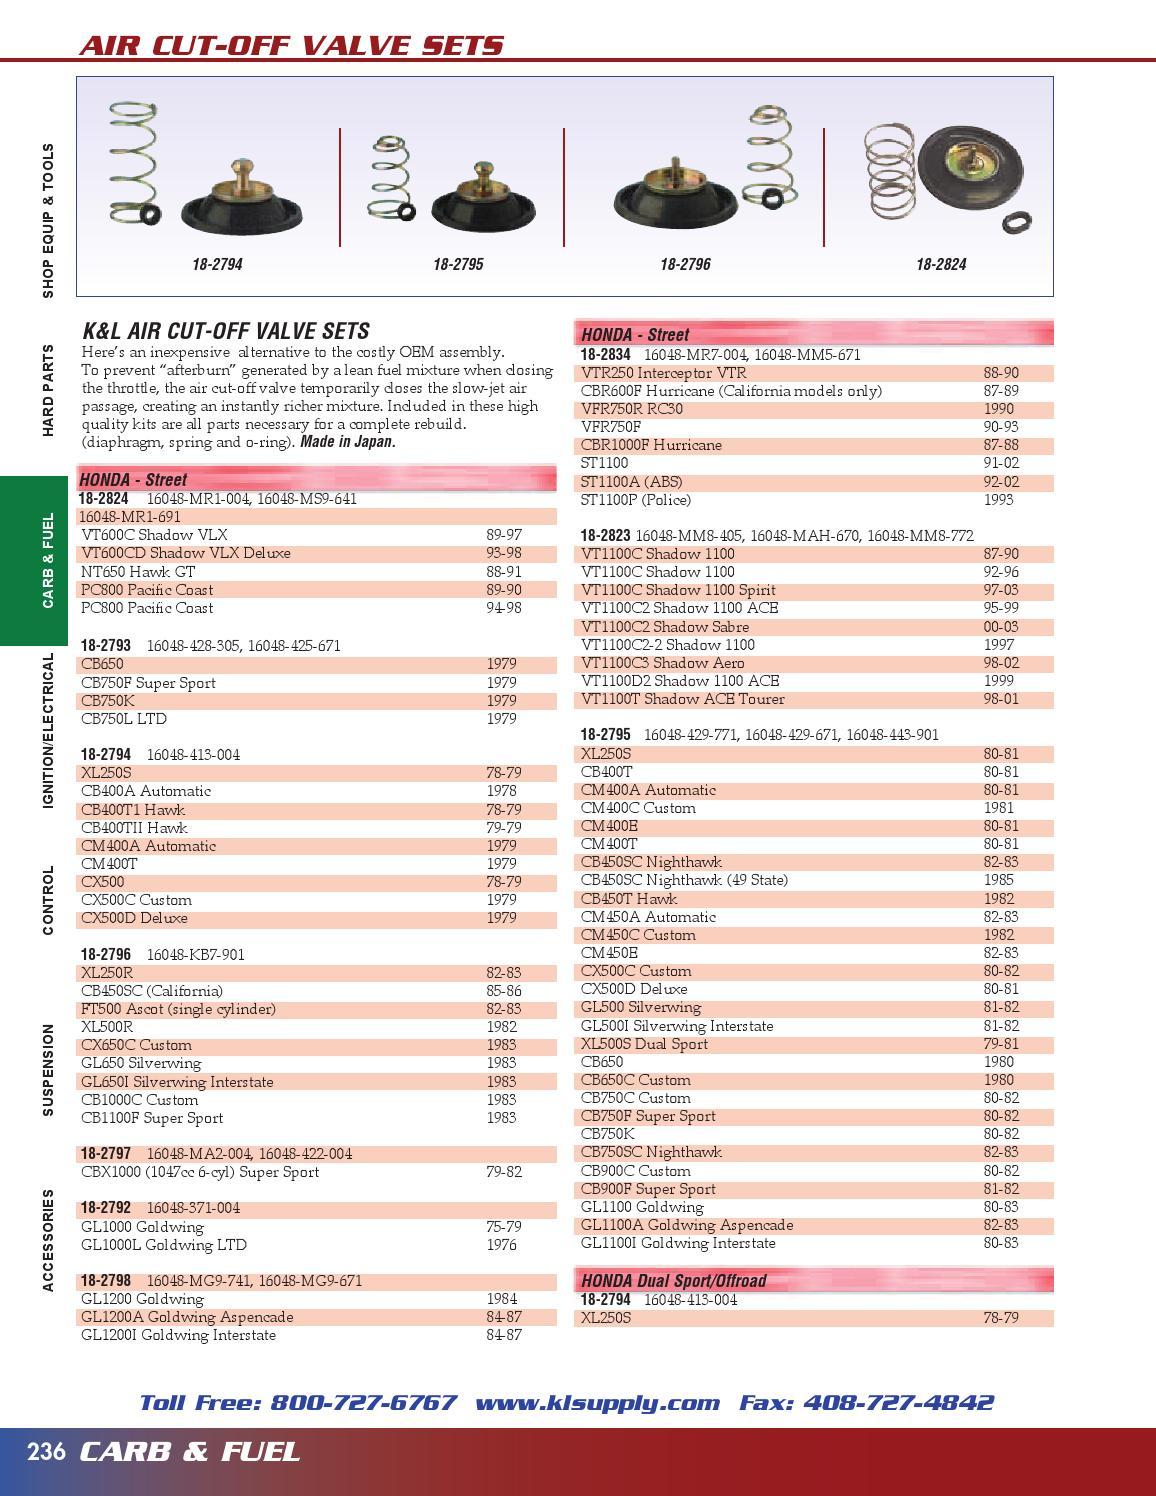 2014 K&L Catalog